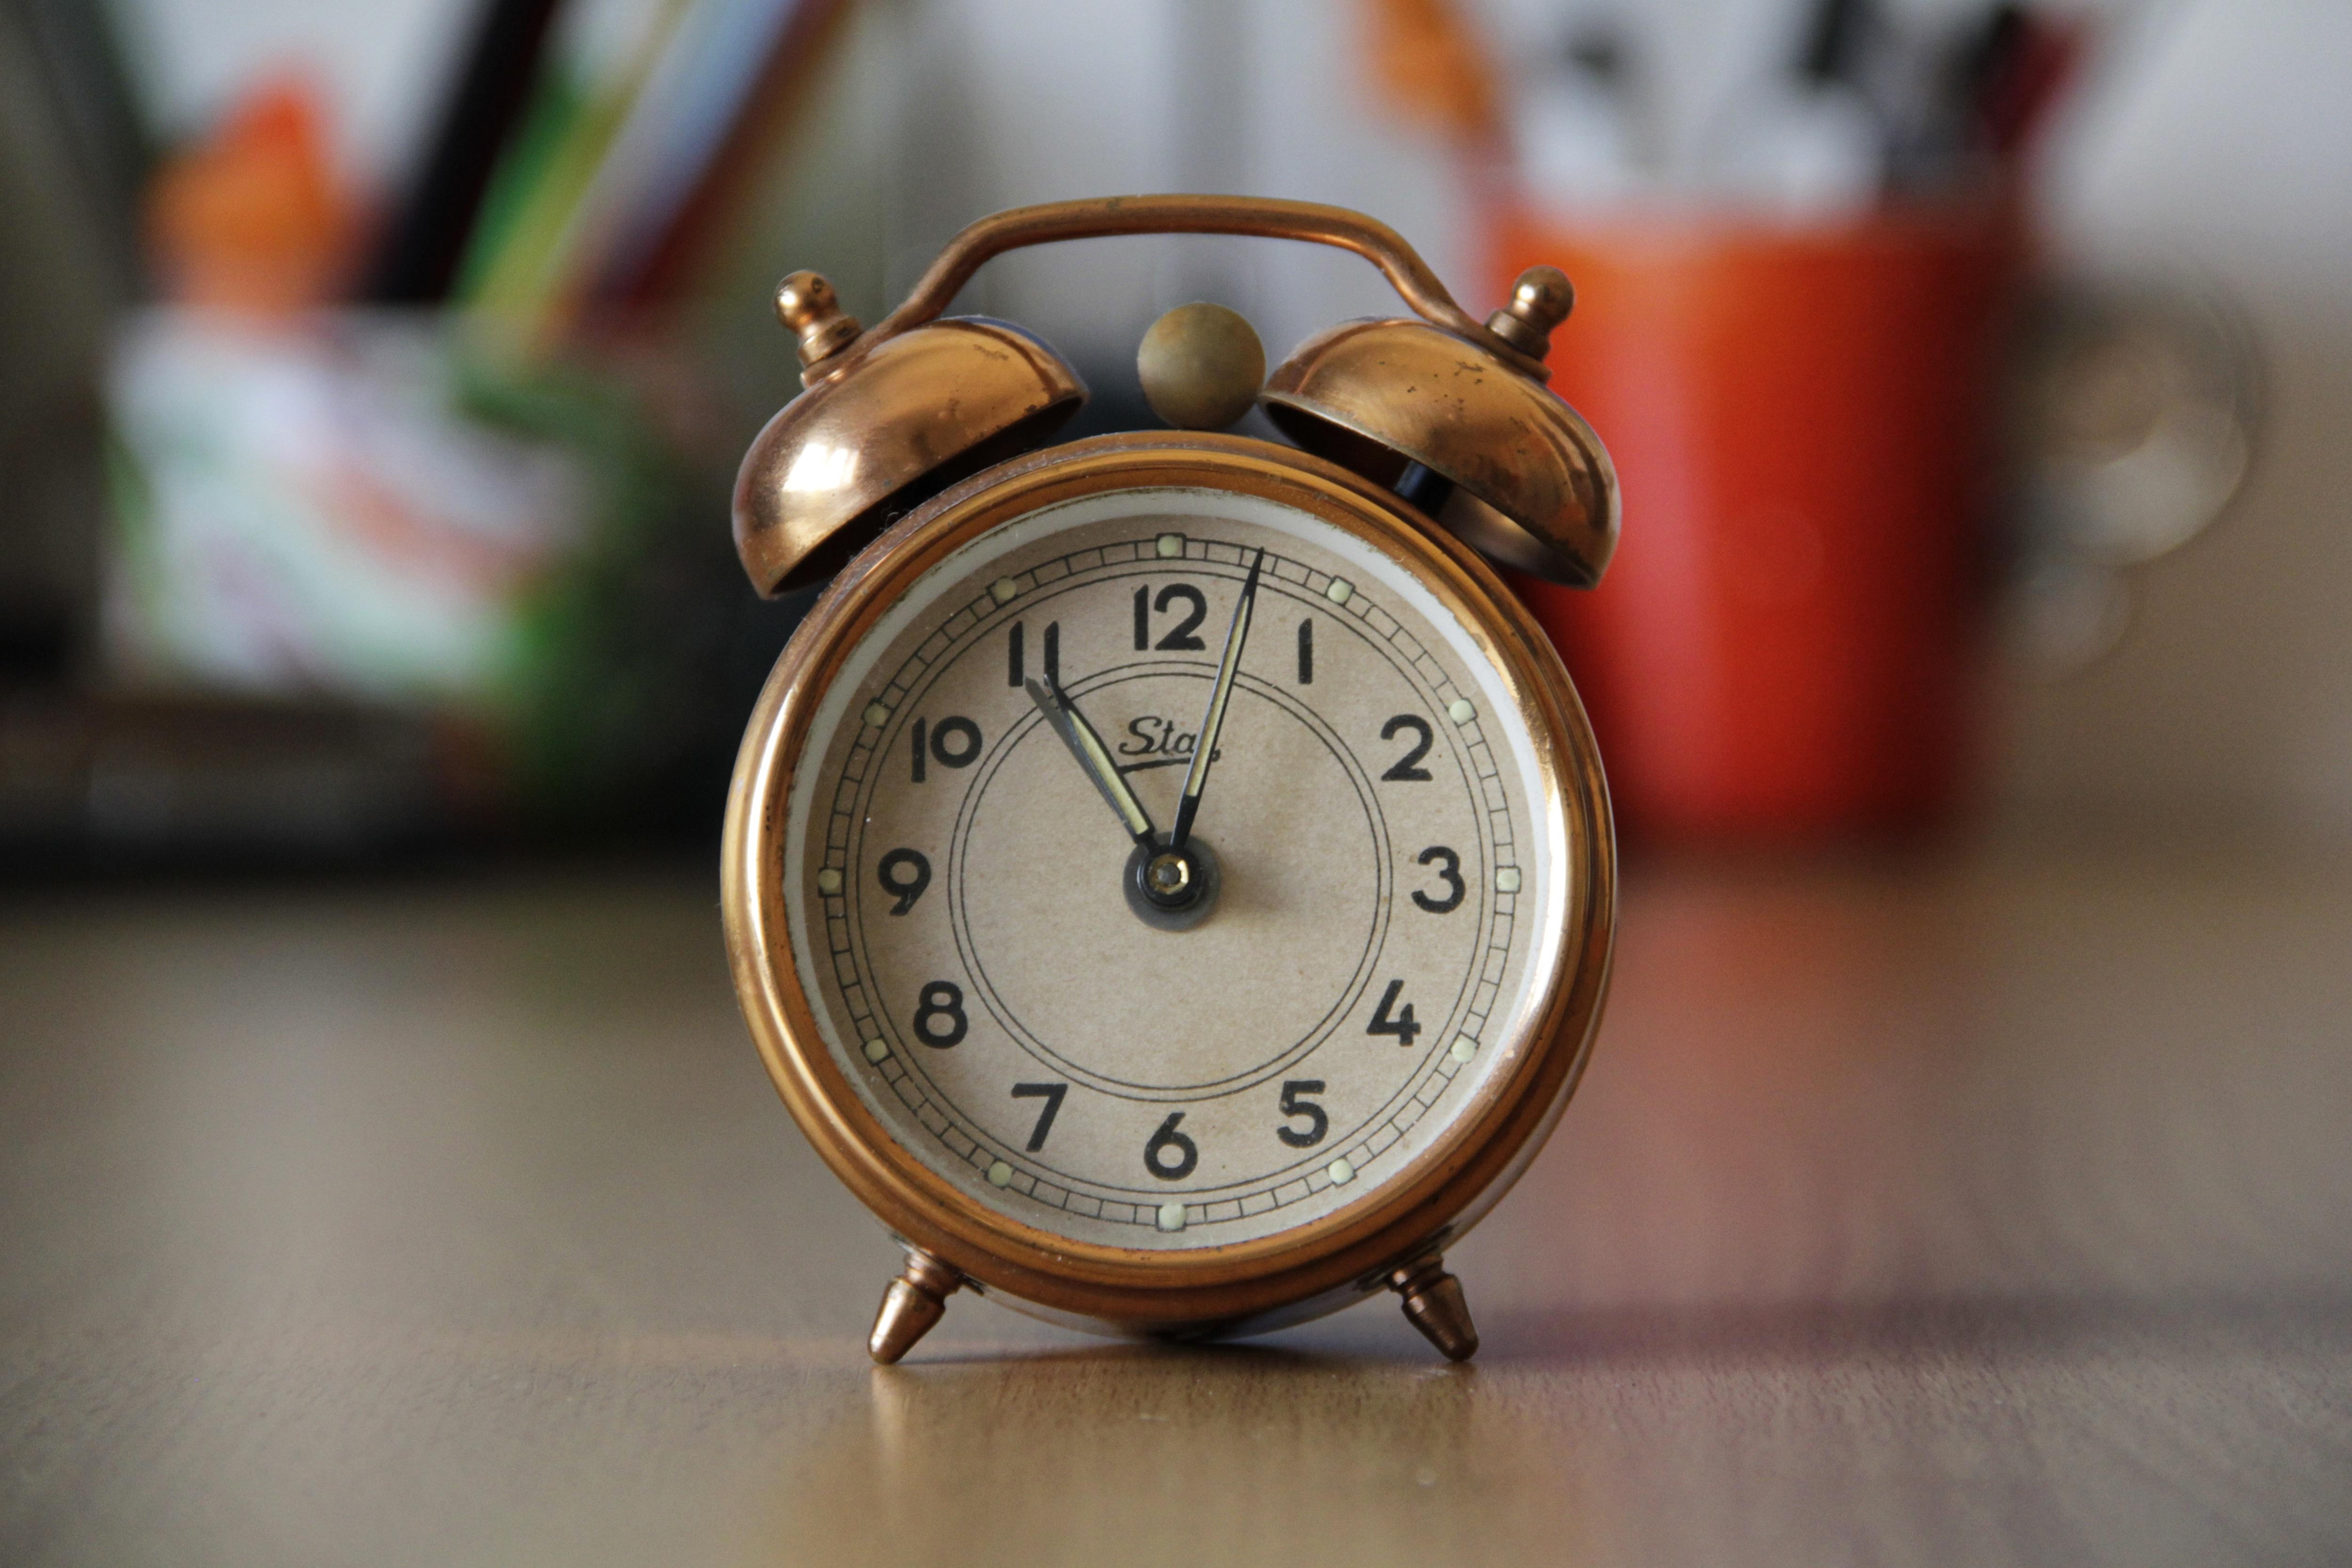 Free Images : watch, hand, vintage, antique, retro, round ...